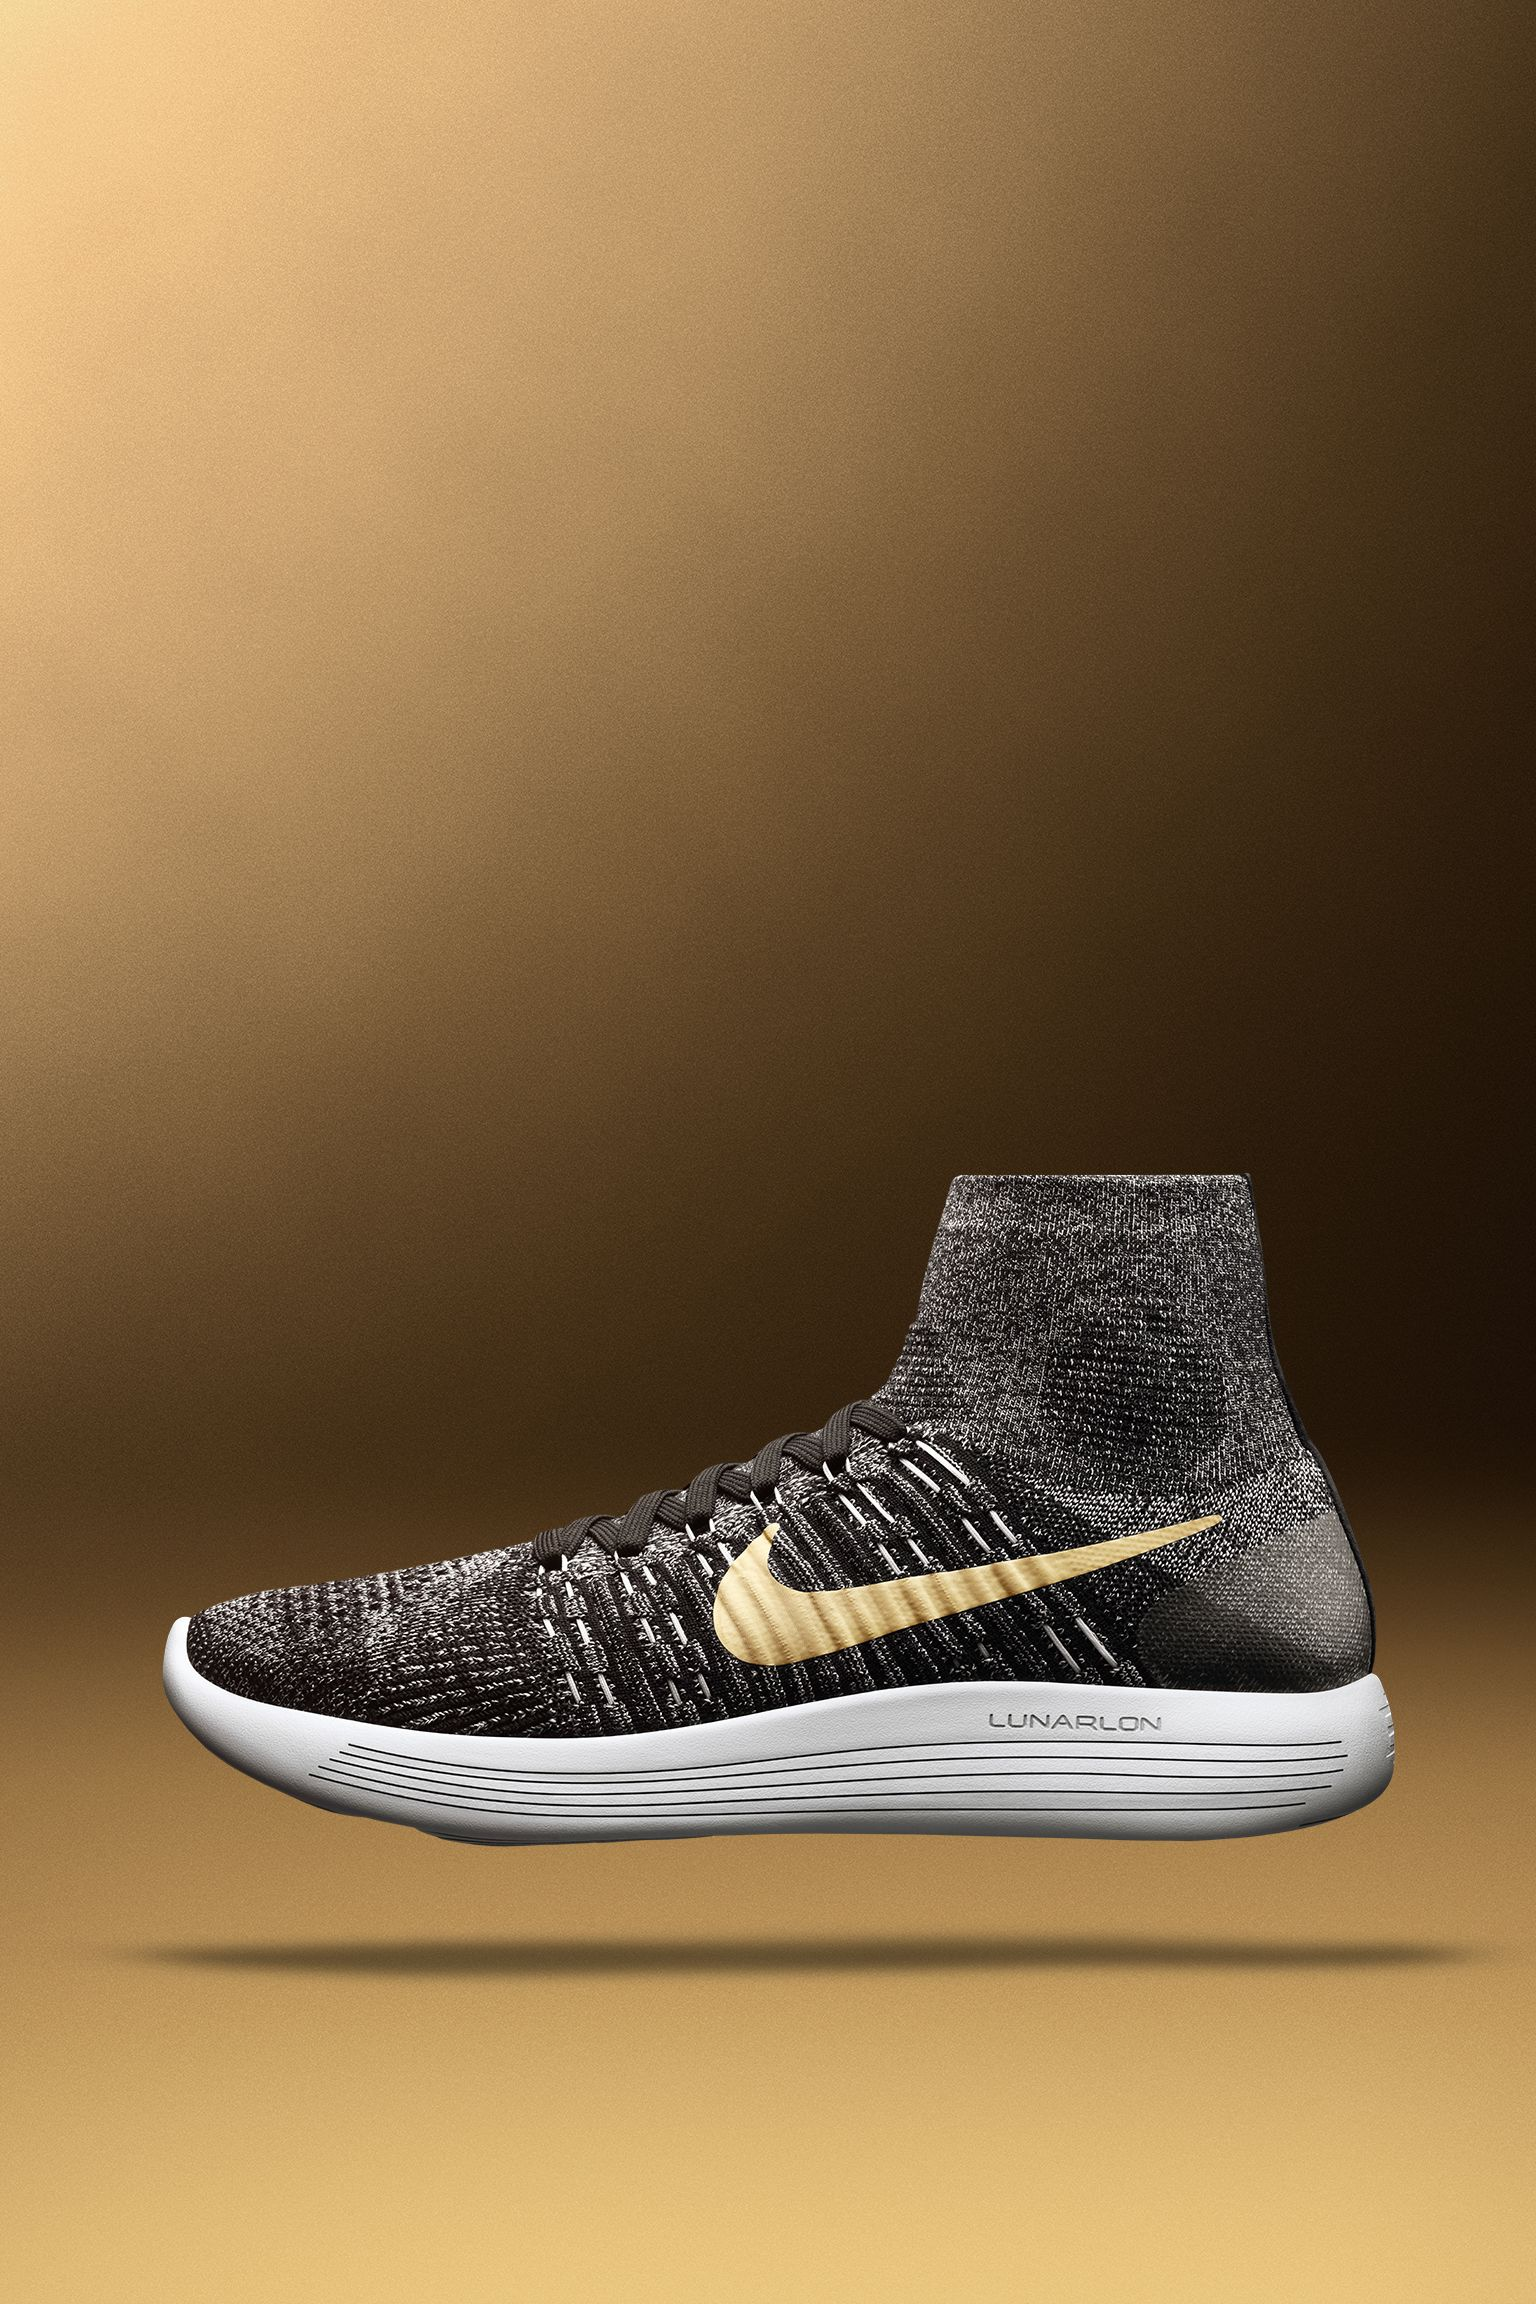 Nike Lunarepic Flyknit BHM 2017